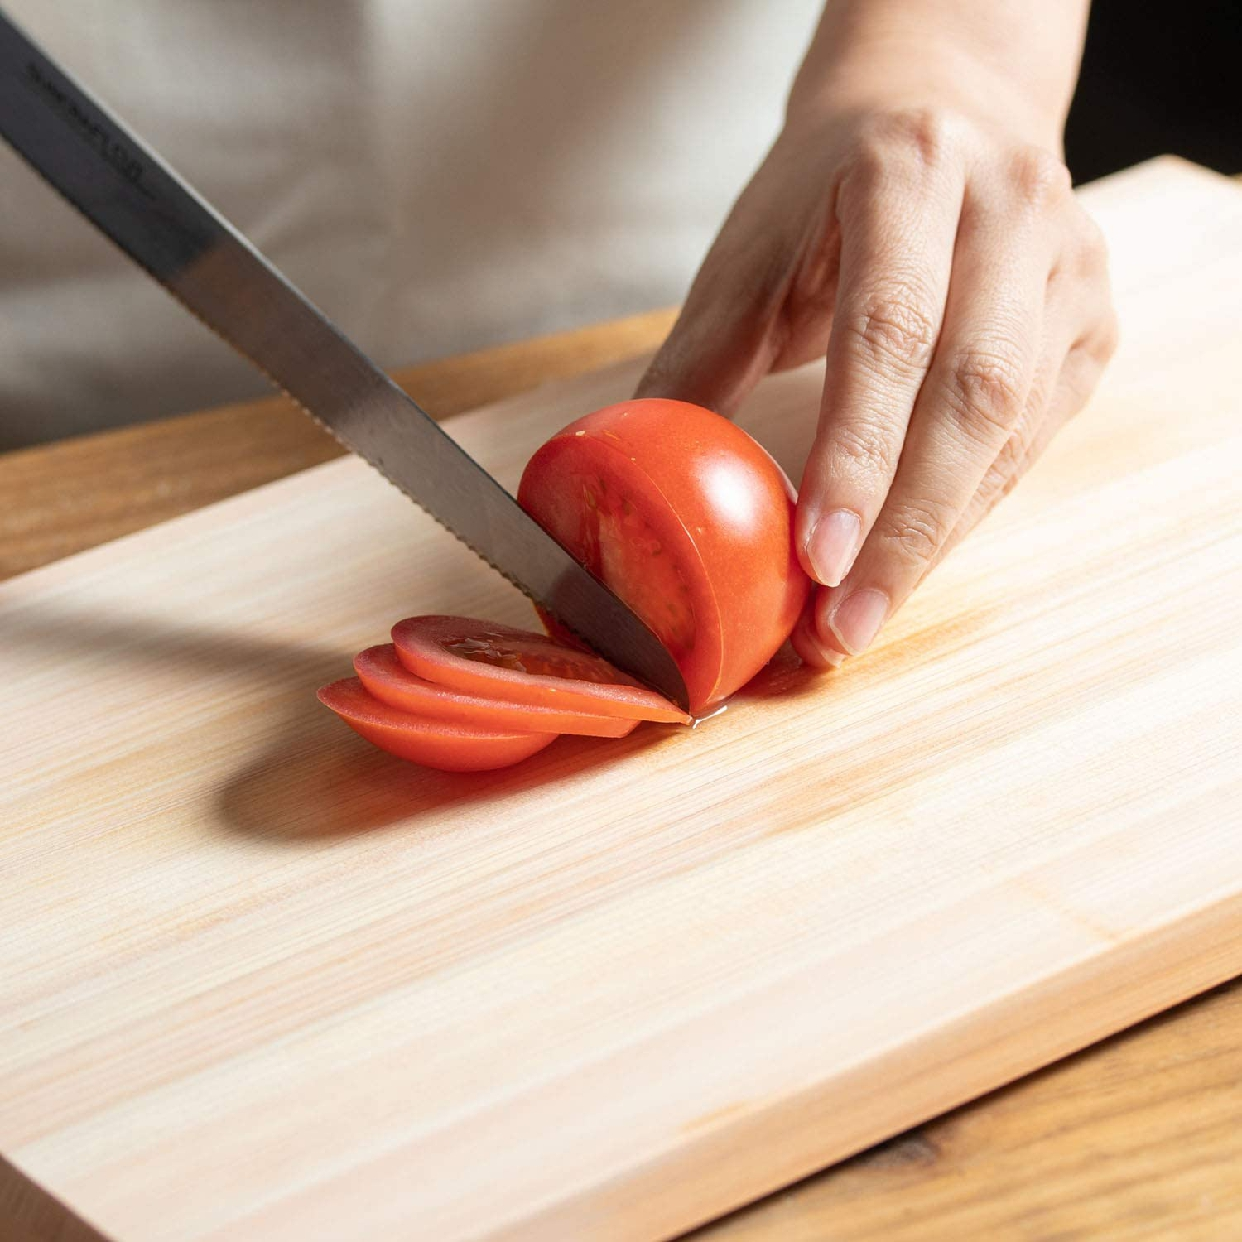 SUNCRAFT(サンクラフト) スムーズパン切りナイフ HE-2101の商品画像6